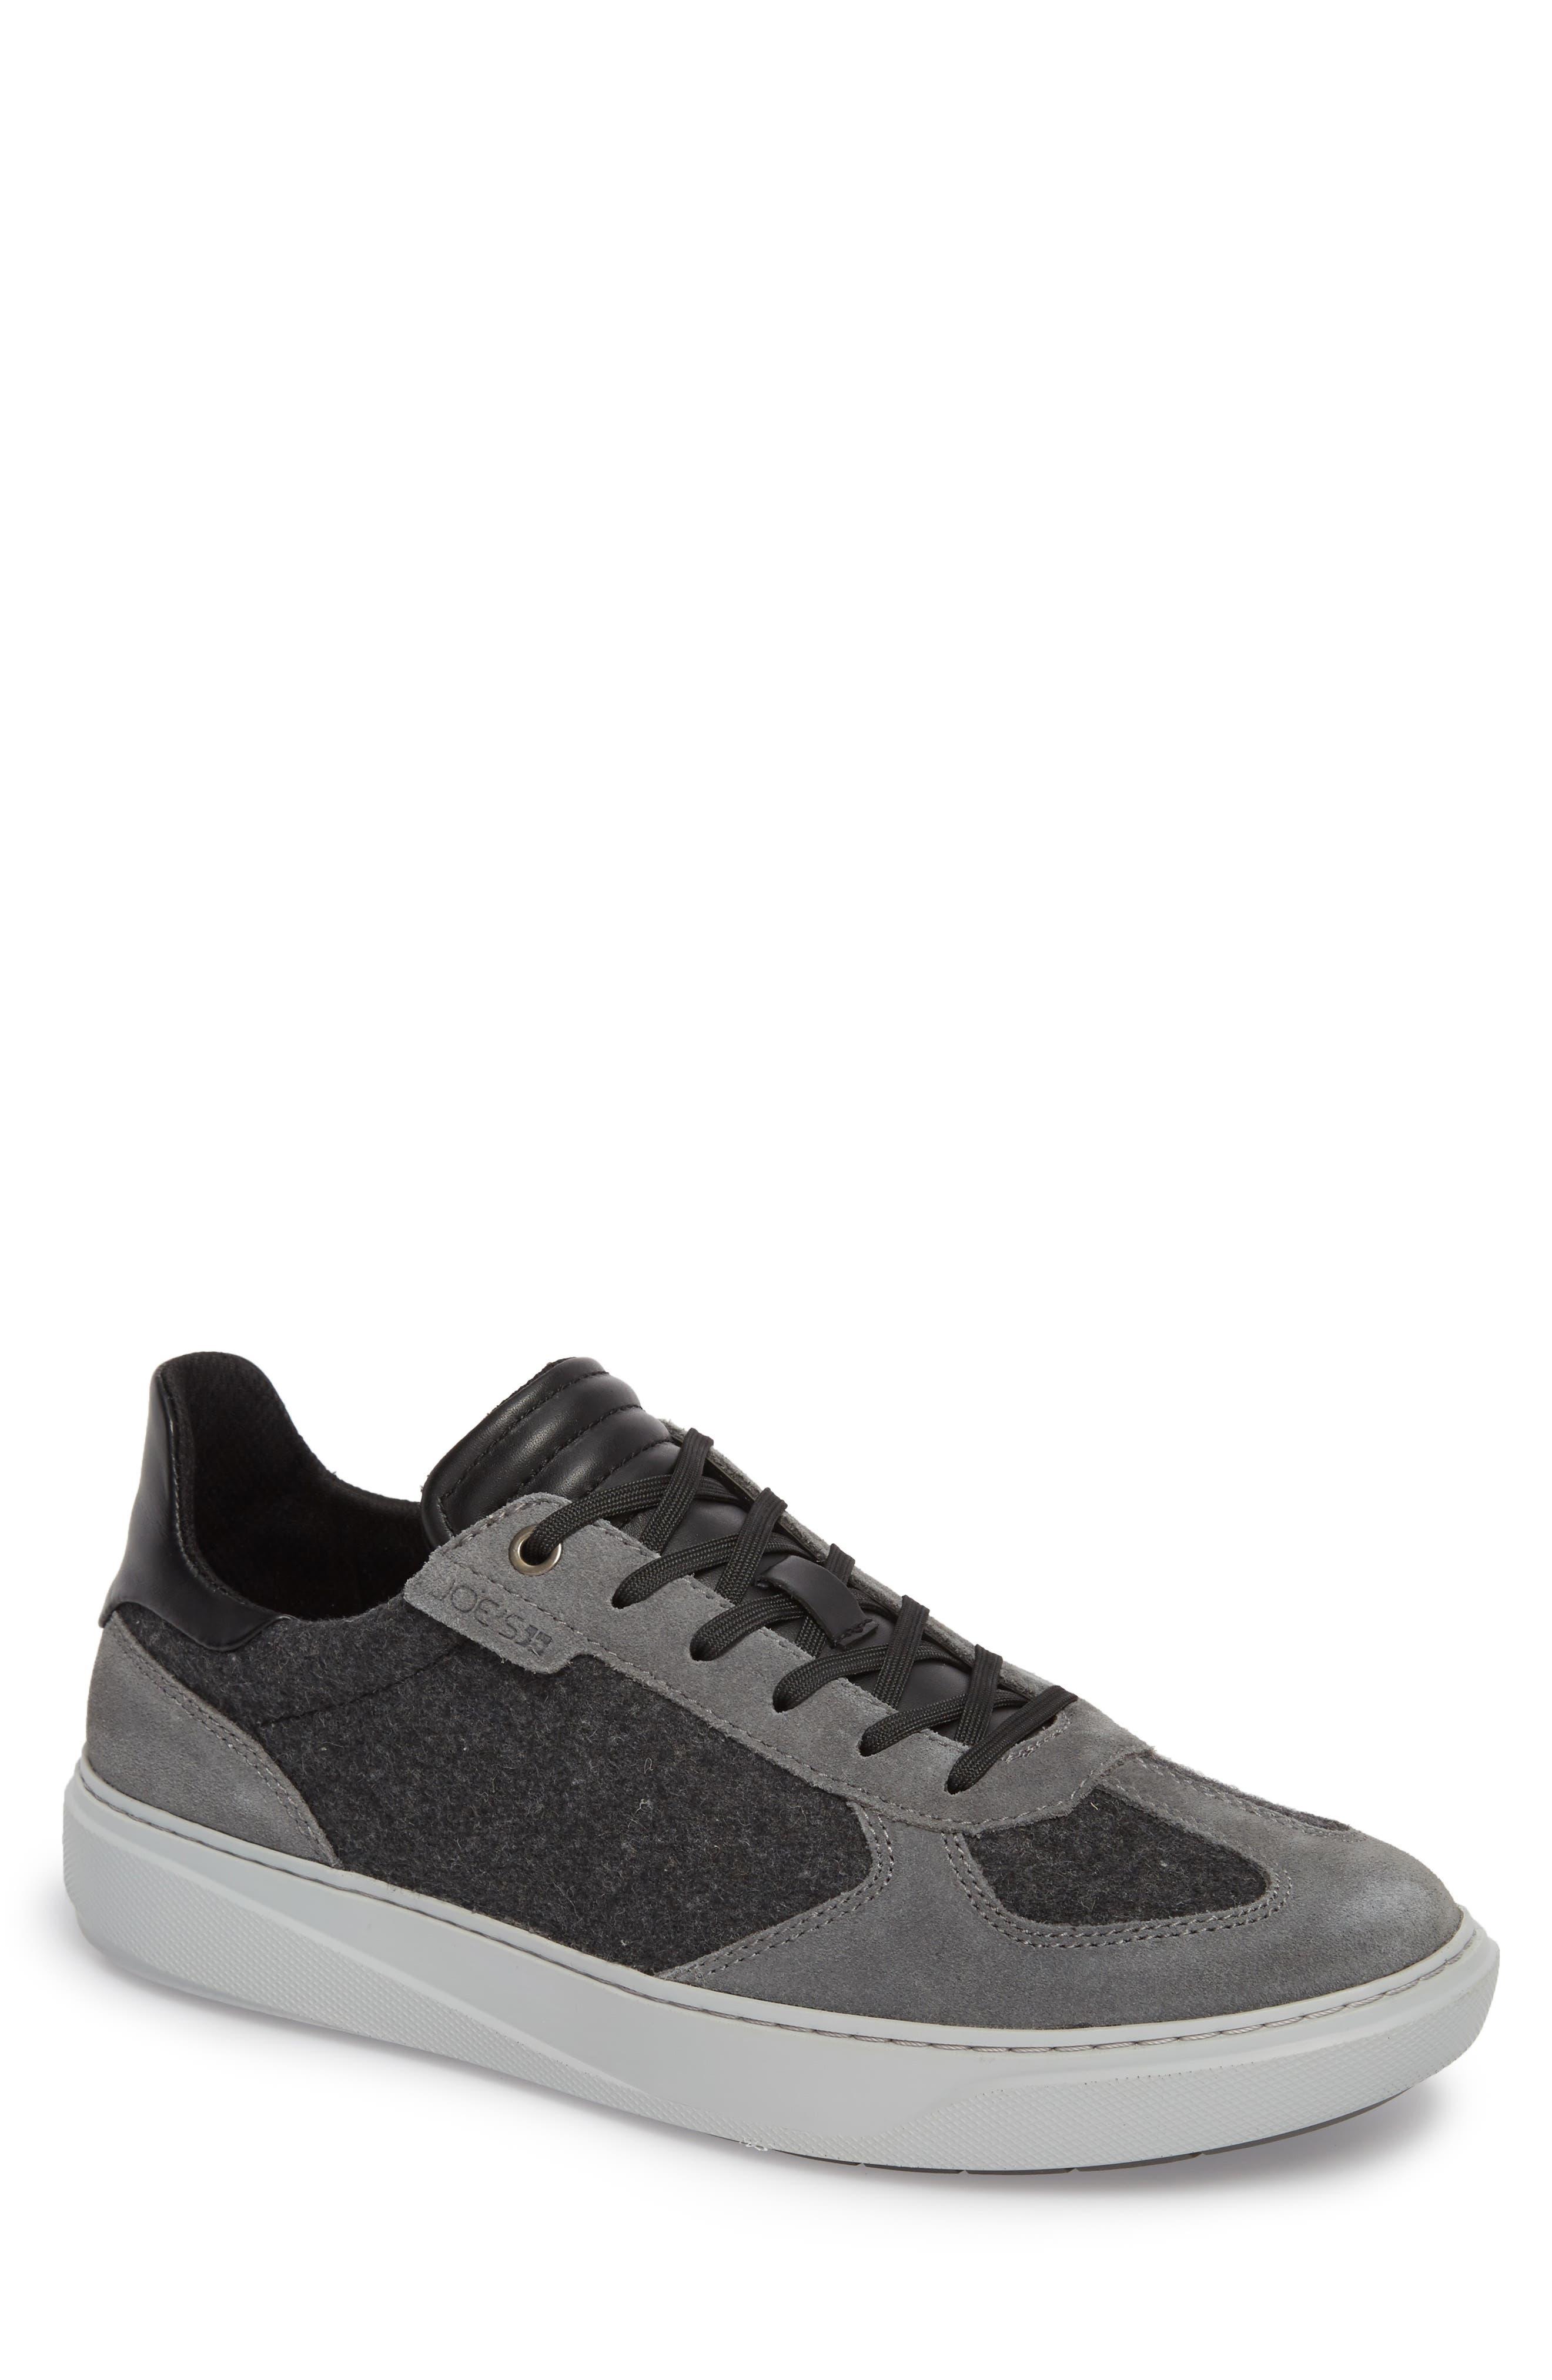 Mo Joe Sneaker,                             Main thumbnail 1, color,                             Charcoal Wool/ Suede